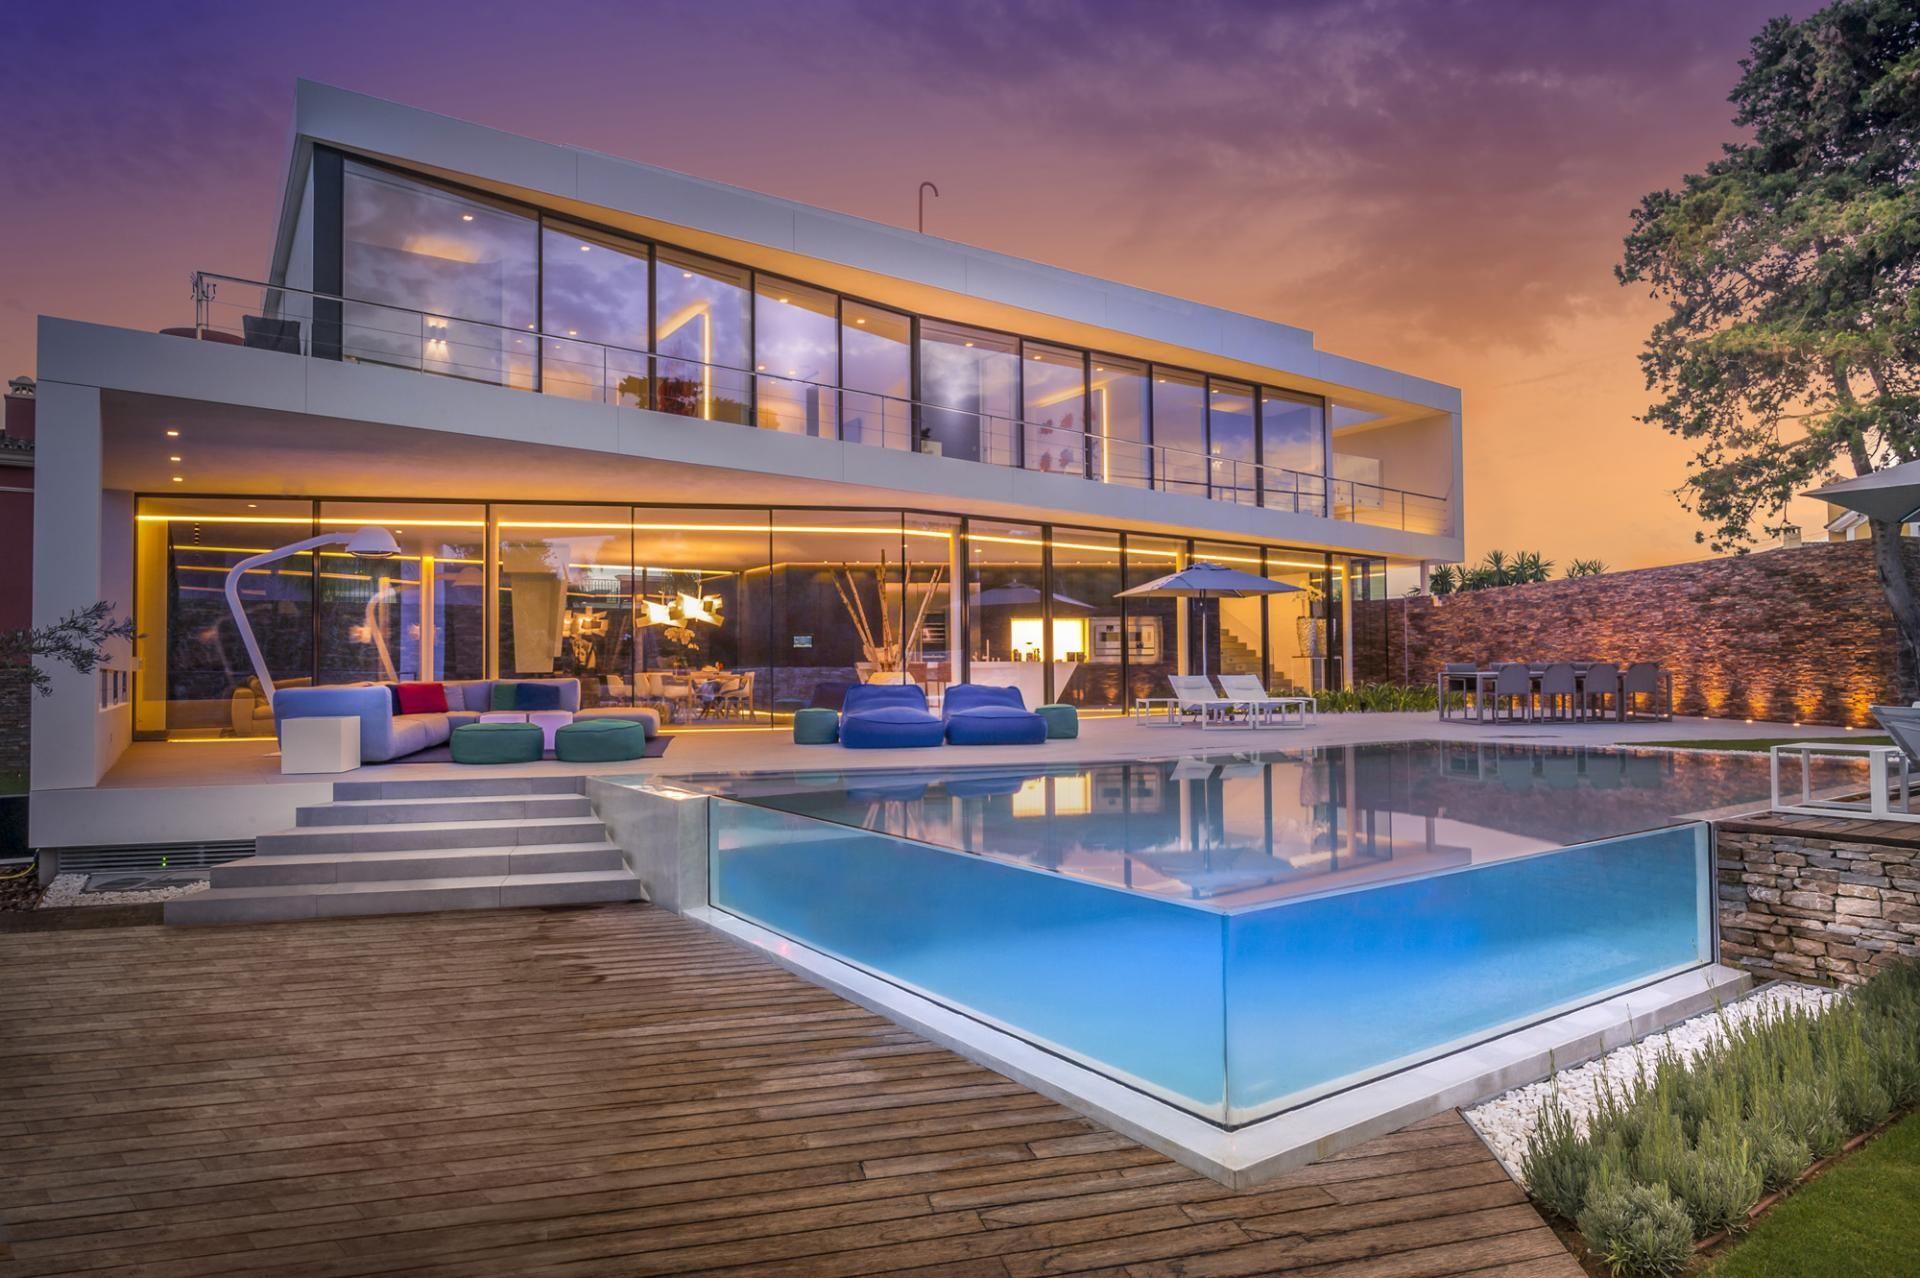 Modern Mediterranean Villa With A Pool ARCH Pinterest